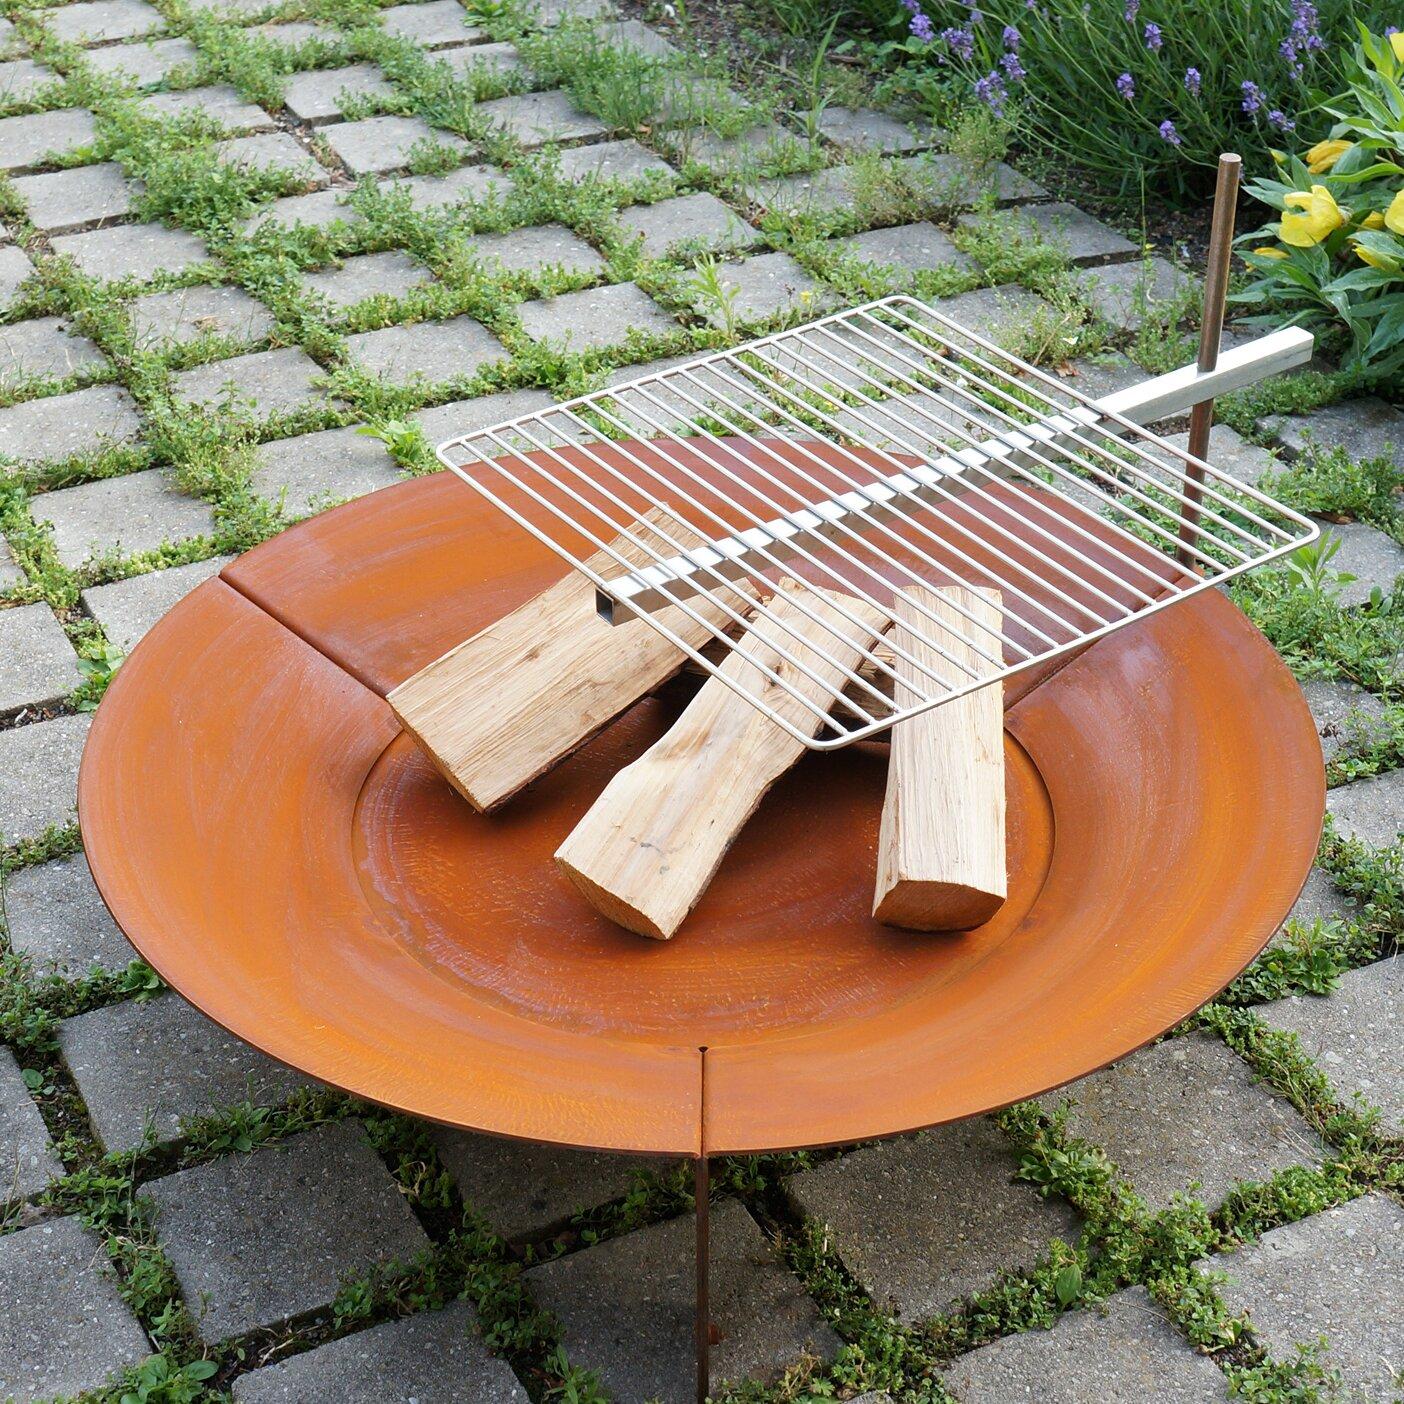 keilbach feuerschale aura aus edelstahl bewertungen. Black Bedroom Furniture Sets. Home Design Ideas